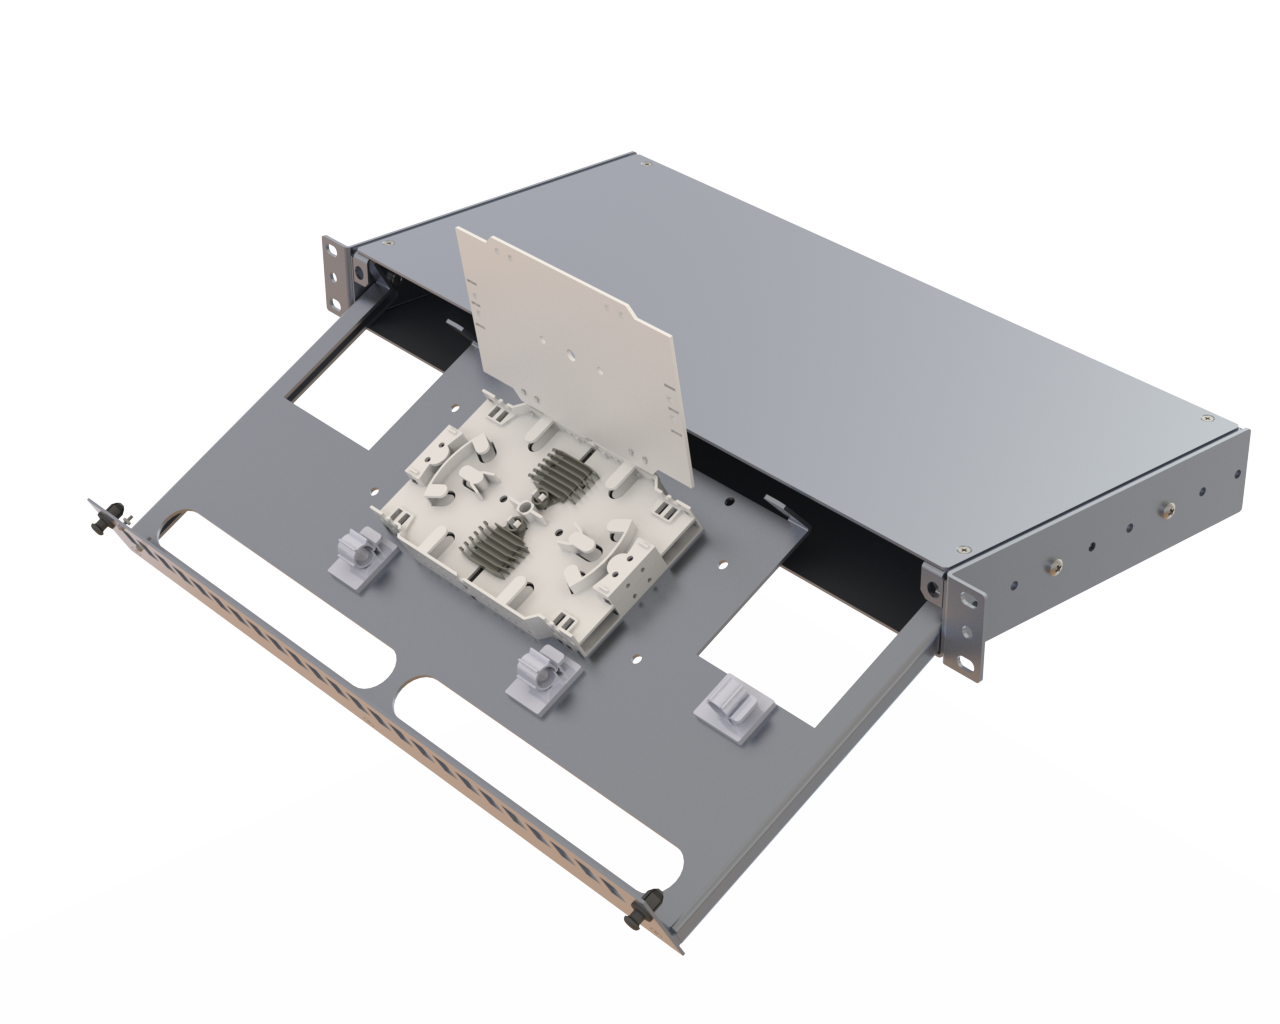 Samm Teknoloji - Alüminyum 1U Boş Panel | 24 Yuva (1)